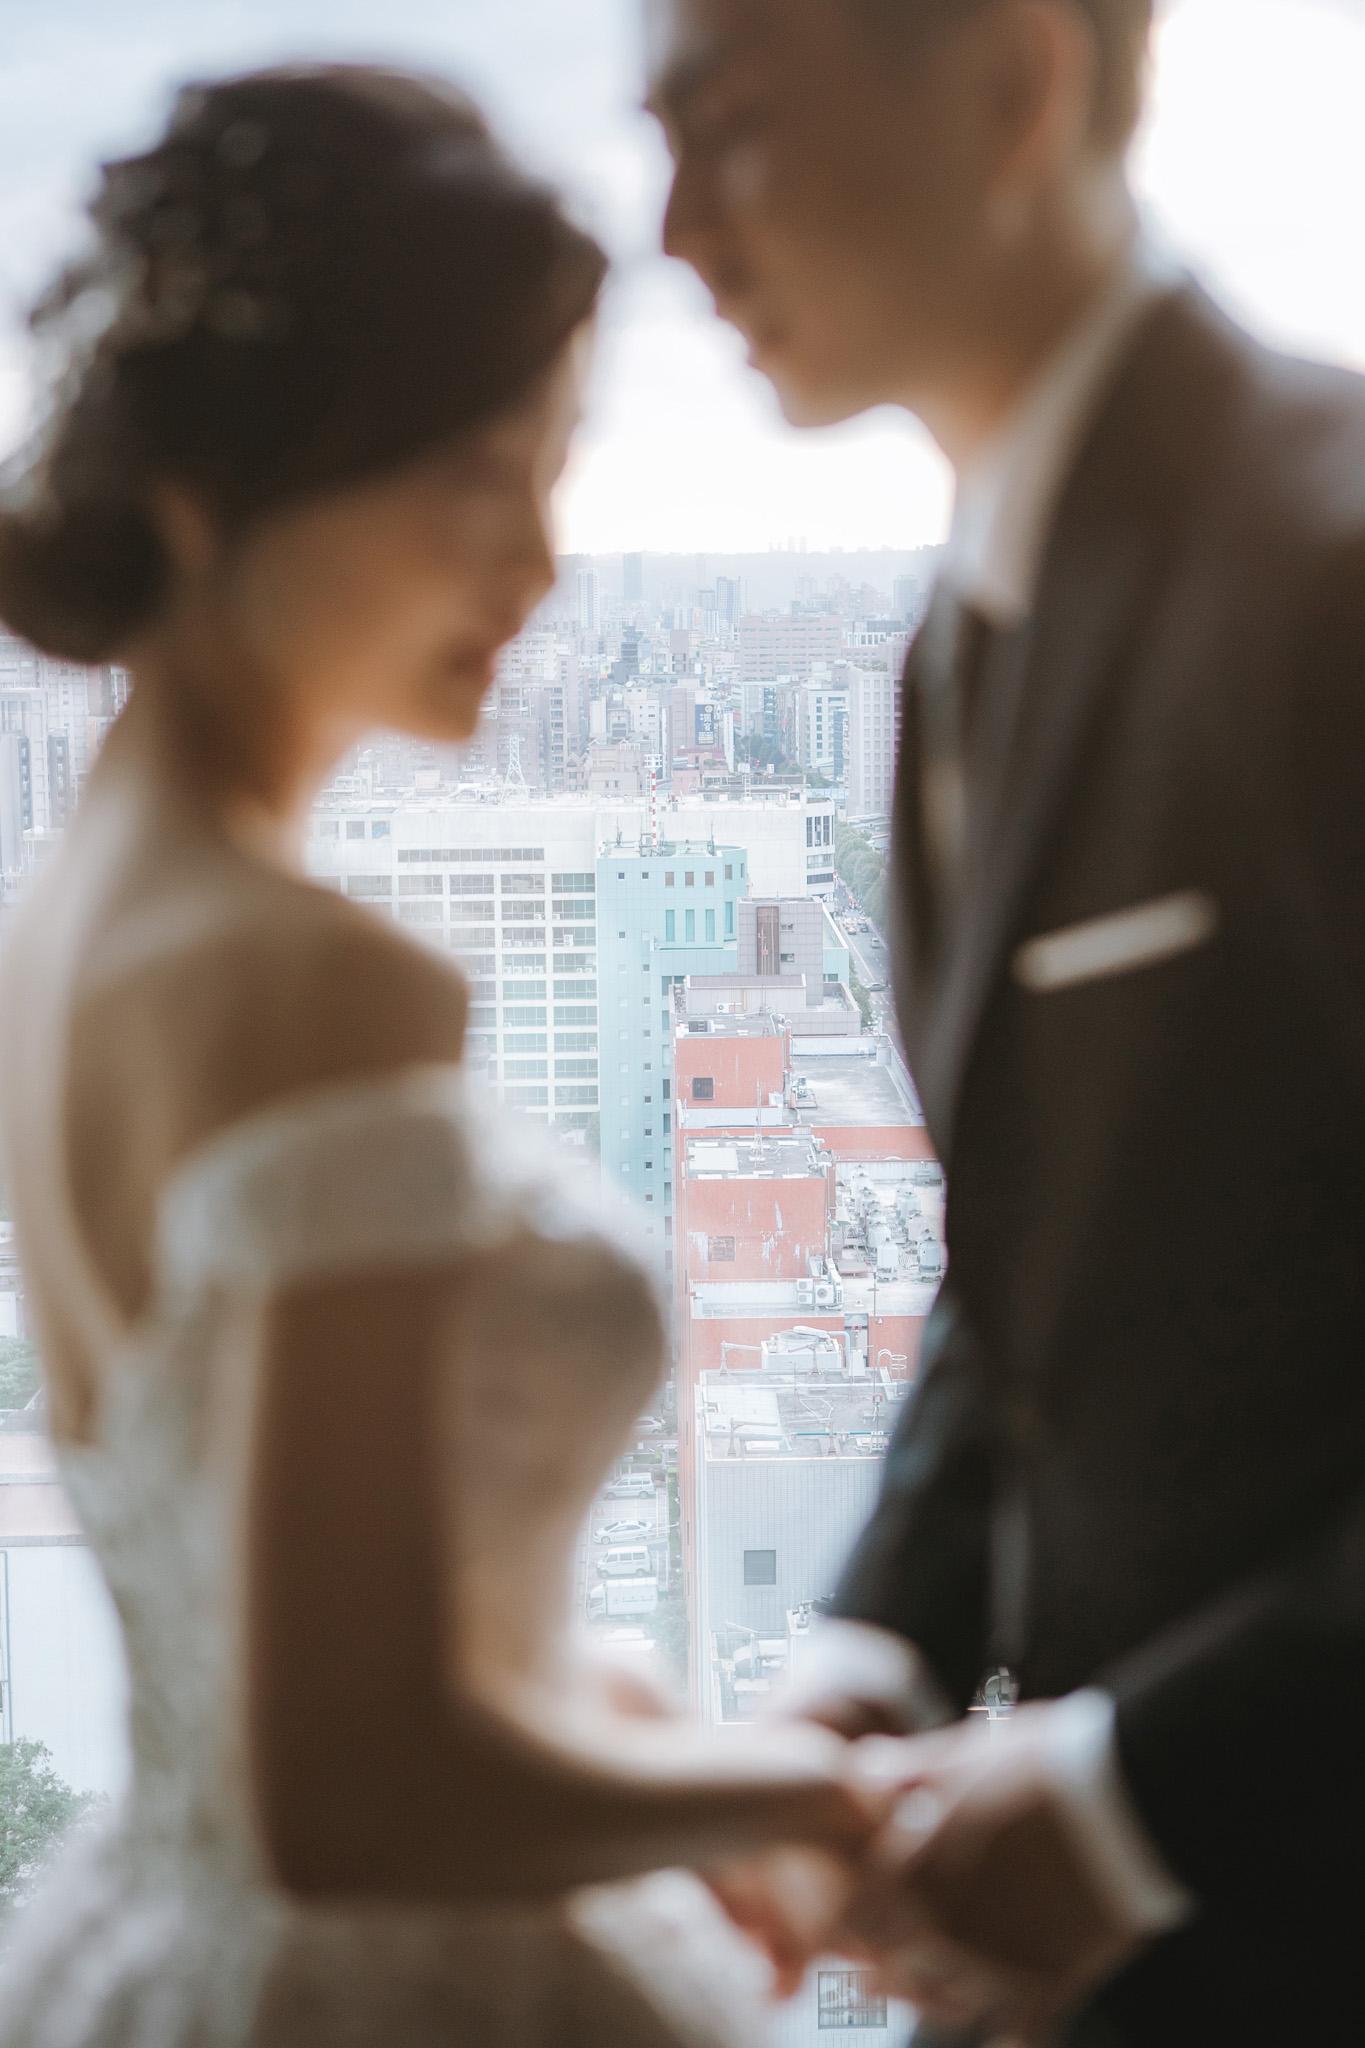 EW 居米 台北禮服 台北婚紗 台北婚攝 國泰萬怡 台北婚禮-2